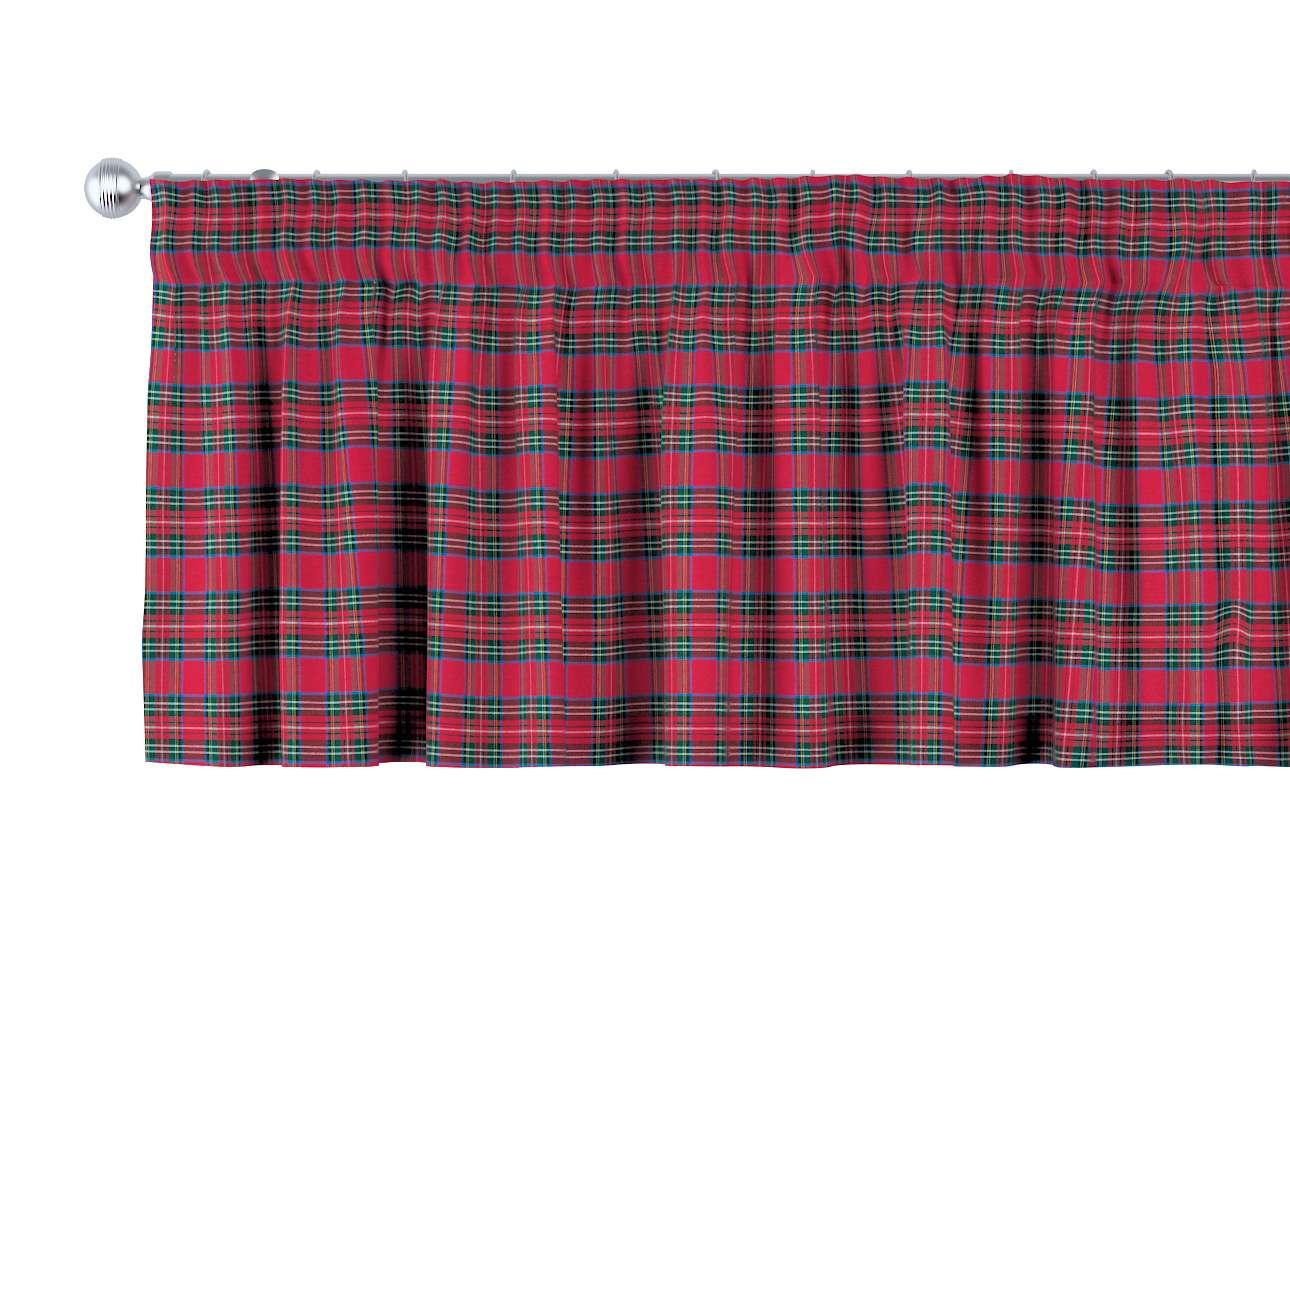 Gardinkappa med rynkband 130 × 40 cm i kollektionen Bristol, Tyg: 126-29